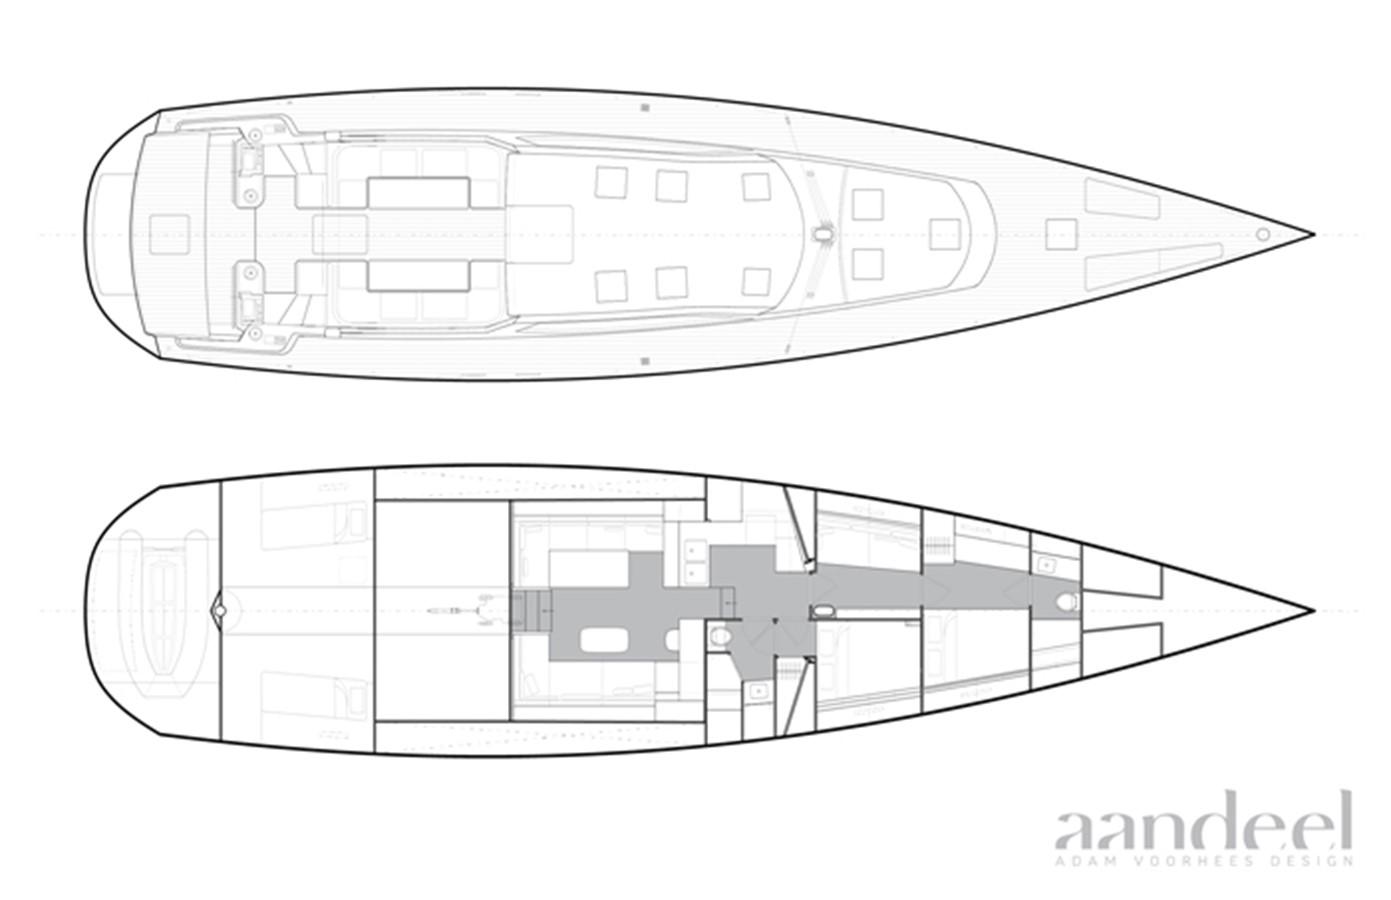 LAYOUT 1996 GOETZ CUSTOM BOATS/DERECKTOR SHIPYARDS Sparkman & Stephens Designed Performance Sailing Yacht Cruising Sailboat 2585513